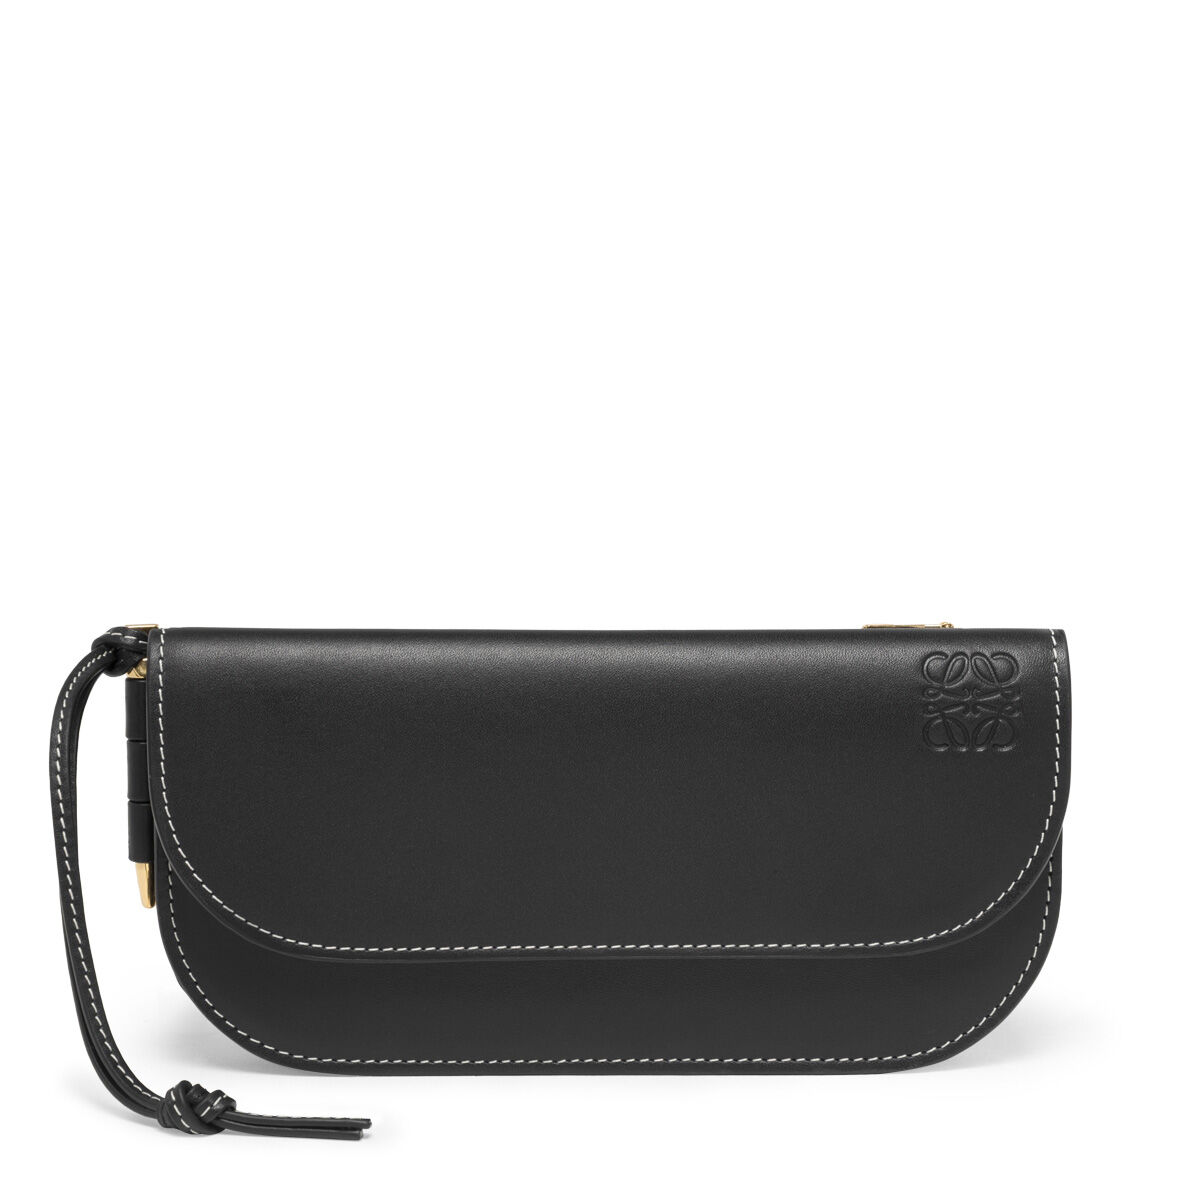 LOEWE Gate Continental Wallet Black/Oxblood front